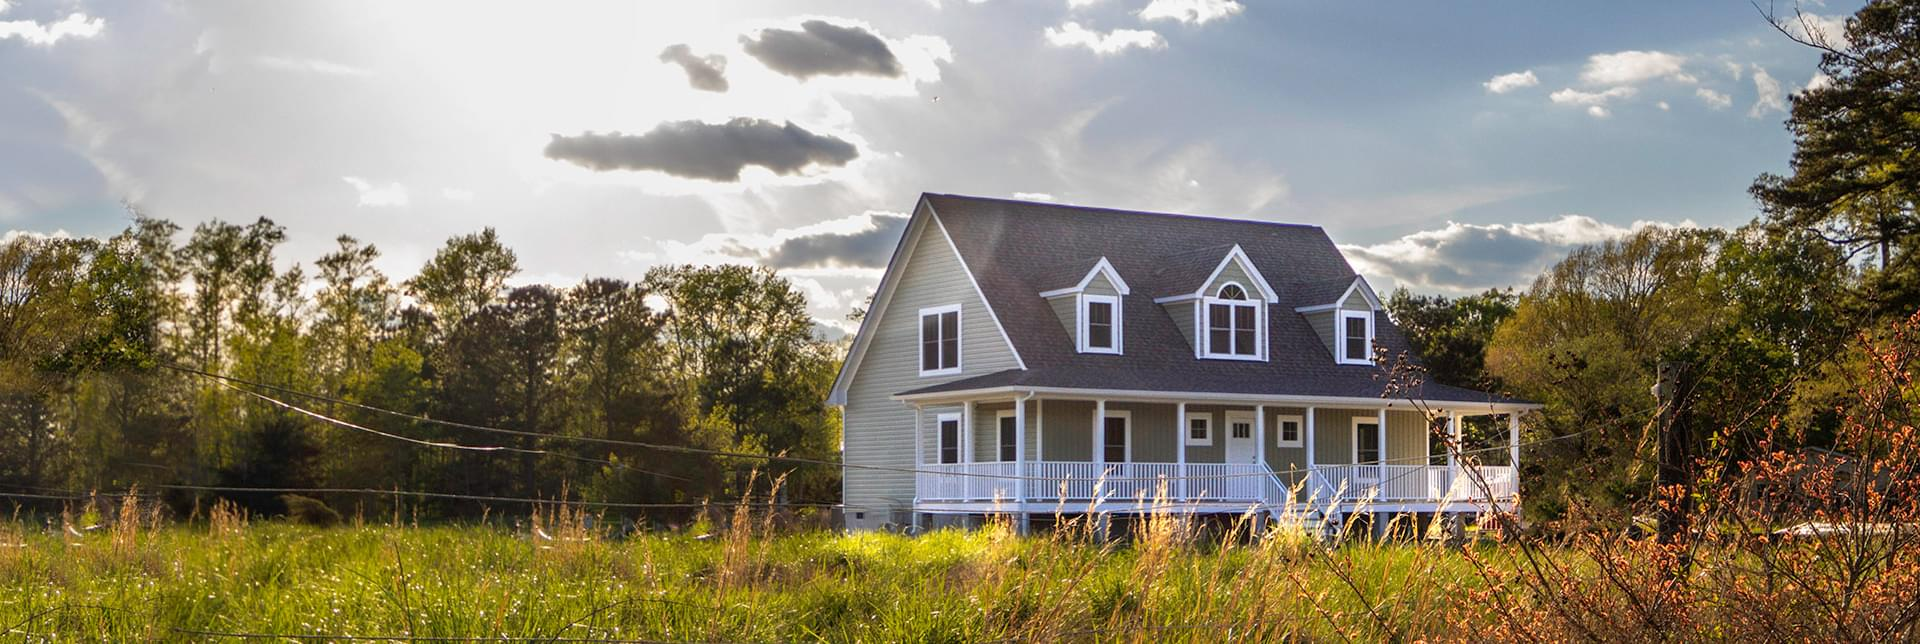 New Homes in Henrico County VA